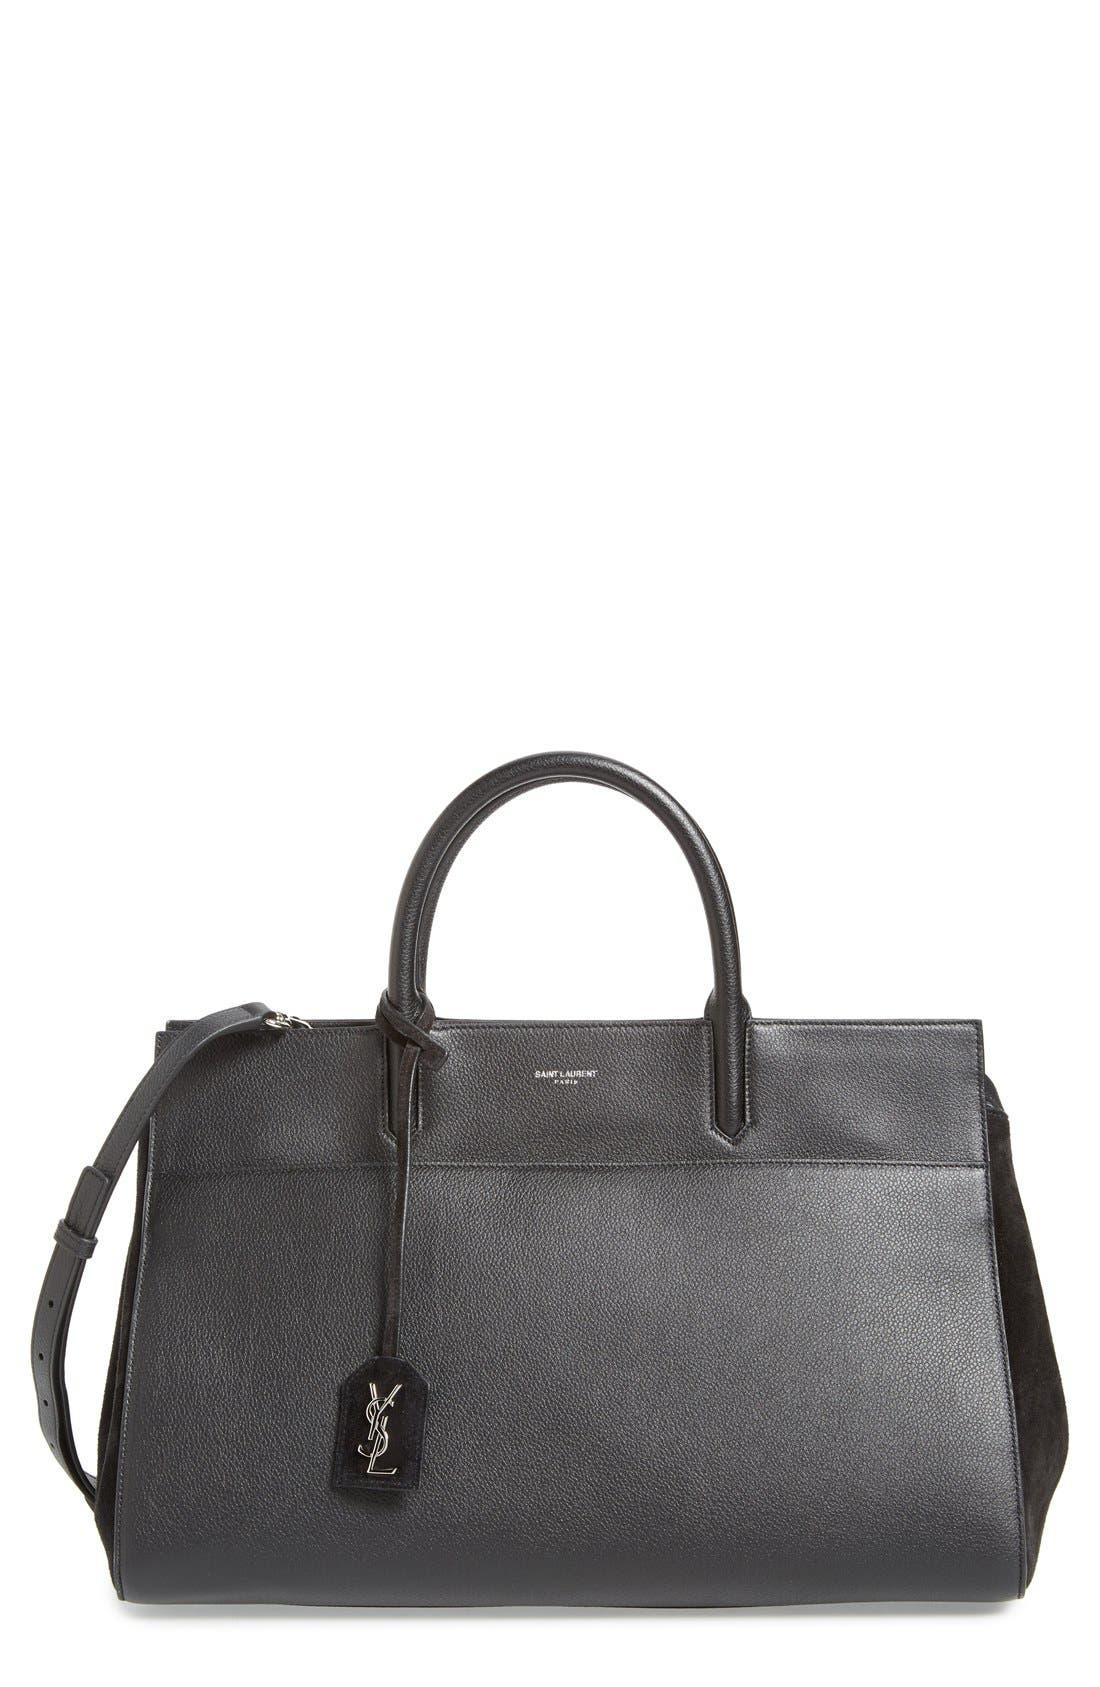 Alternate Image 1 Selected - Saint Laurent 'Medium Rive Gauche' Grained Leather Satchel